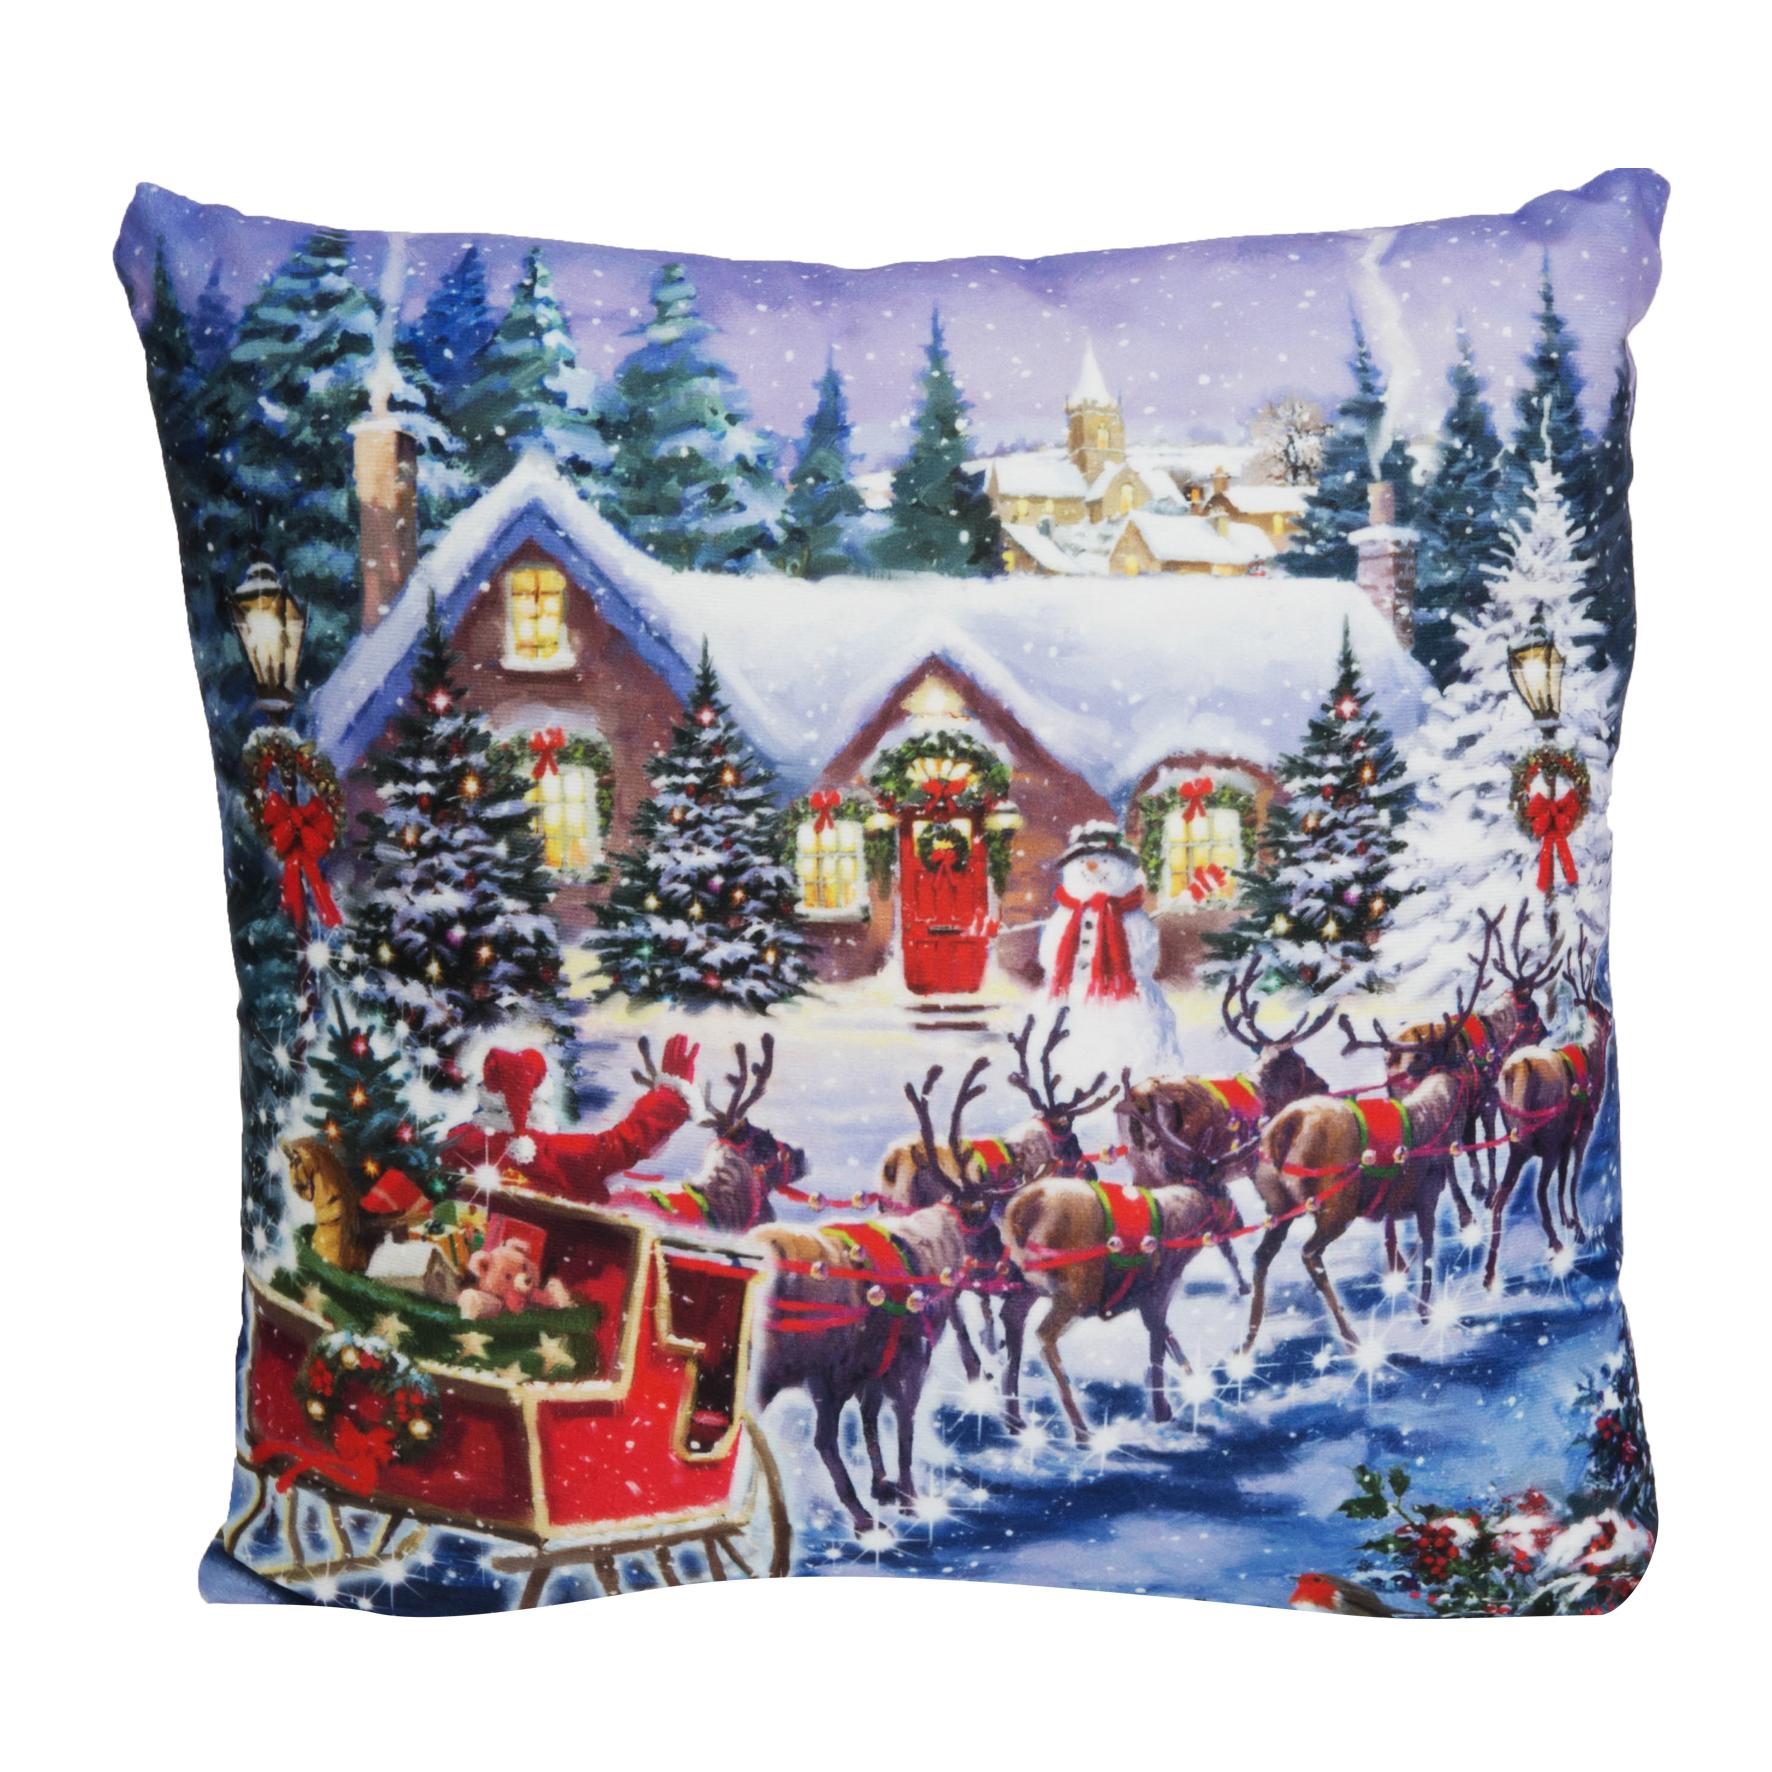 LED LIGHT CHRISTMAS LIGHT UP CUSHION 40CM X 40CM SANTA AND REINDEER